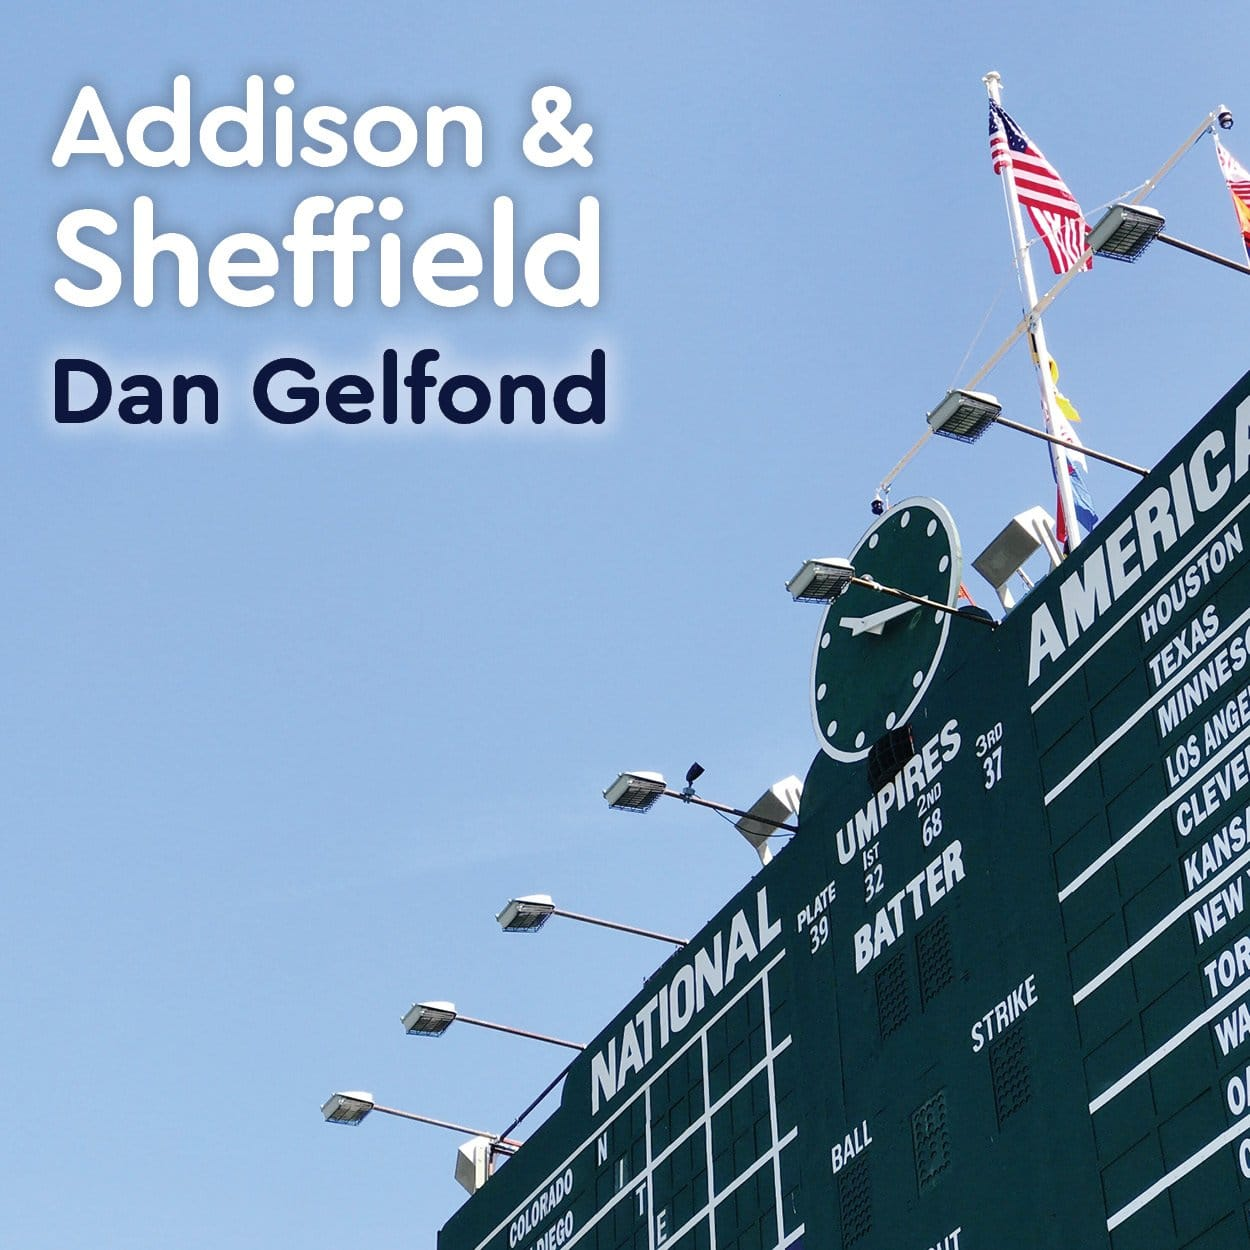 Dan Gelfond at Addison & Sheffield